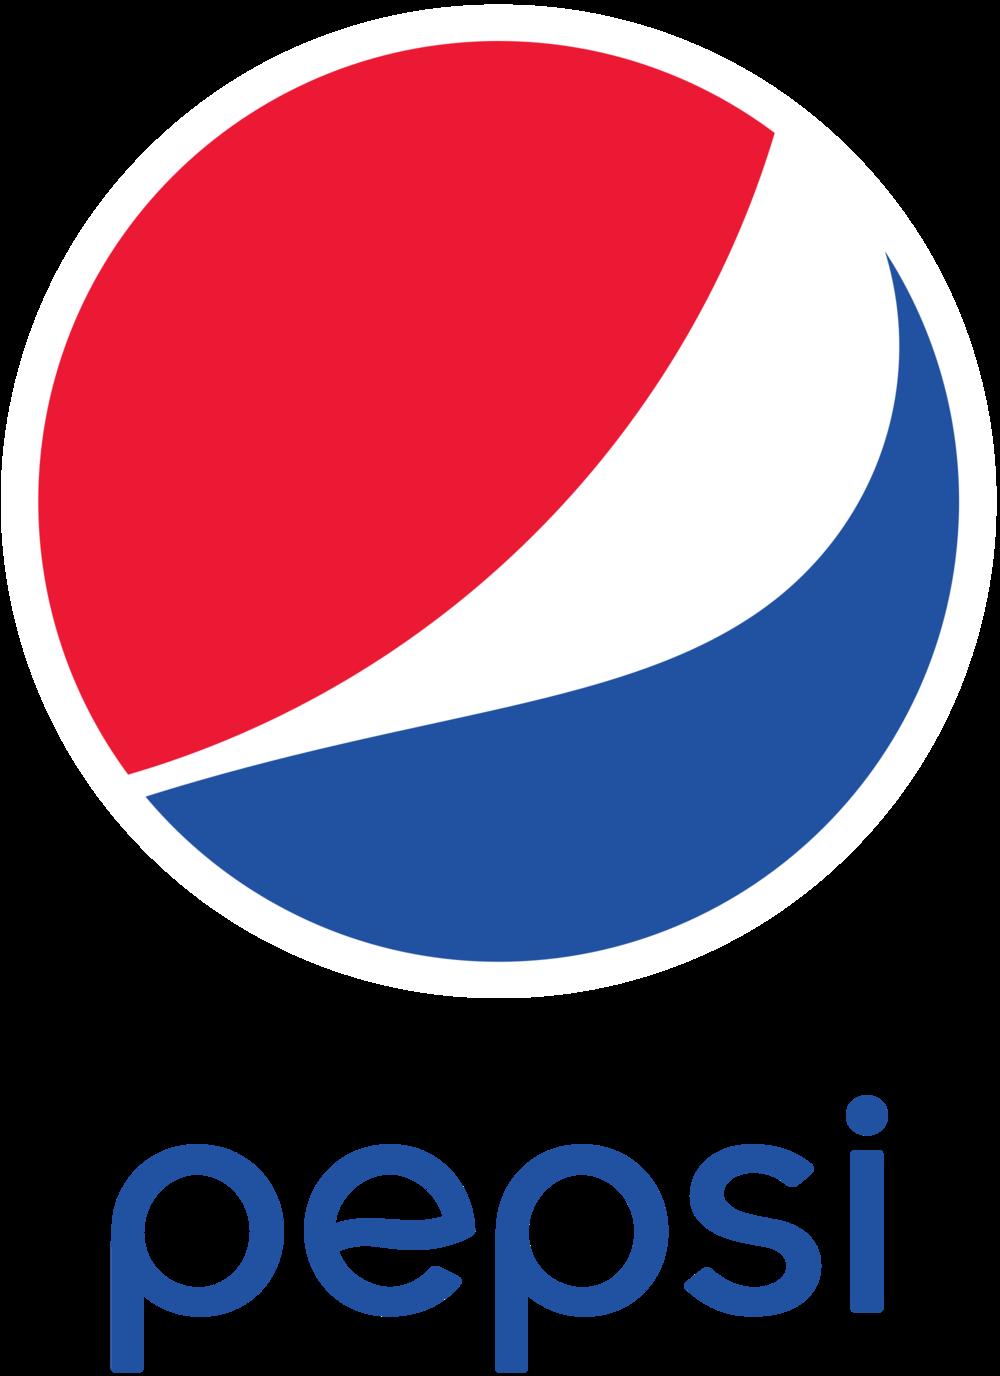 Pepsi's modernized logo